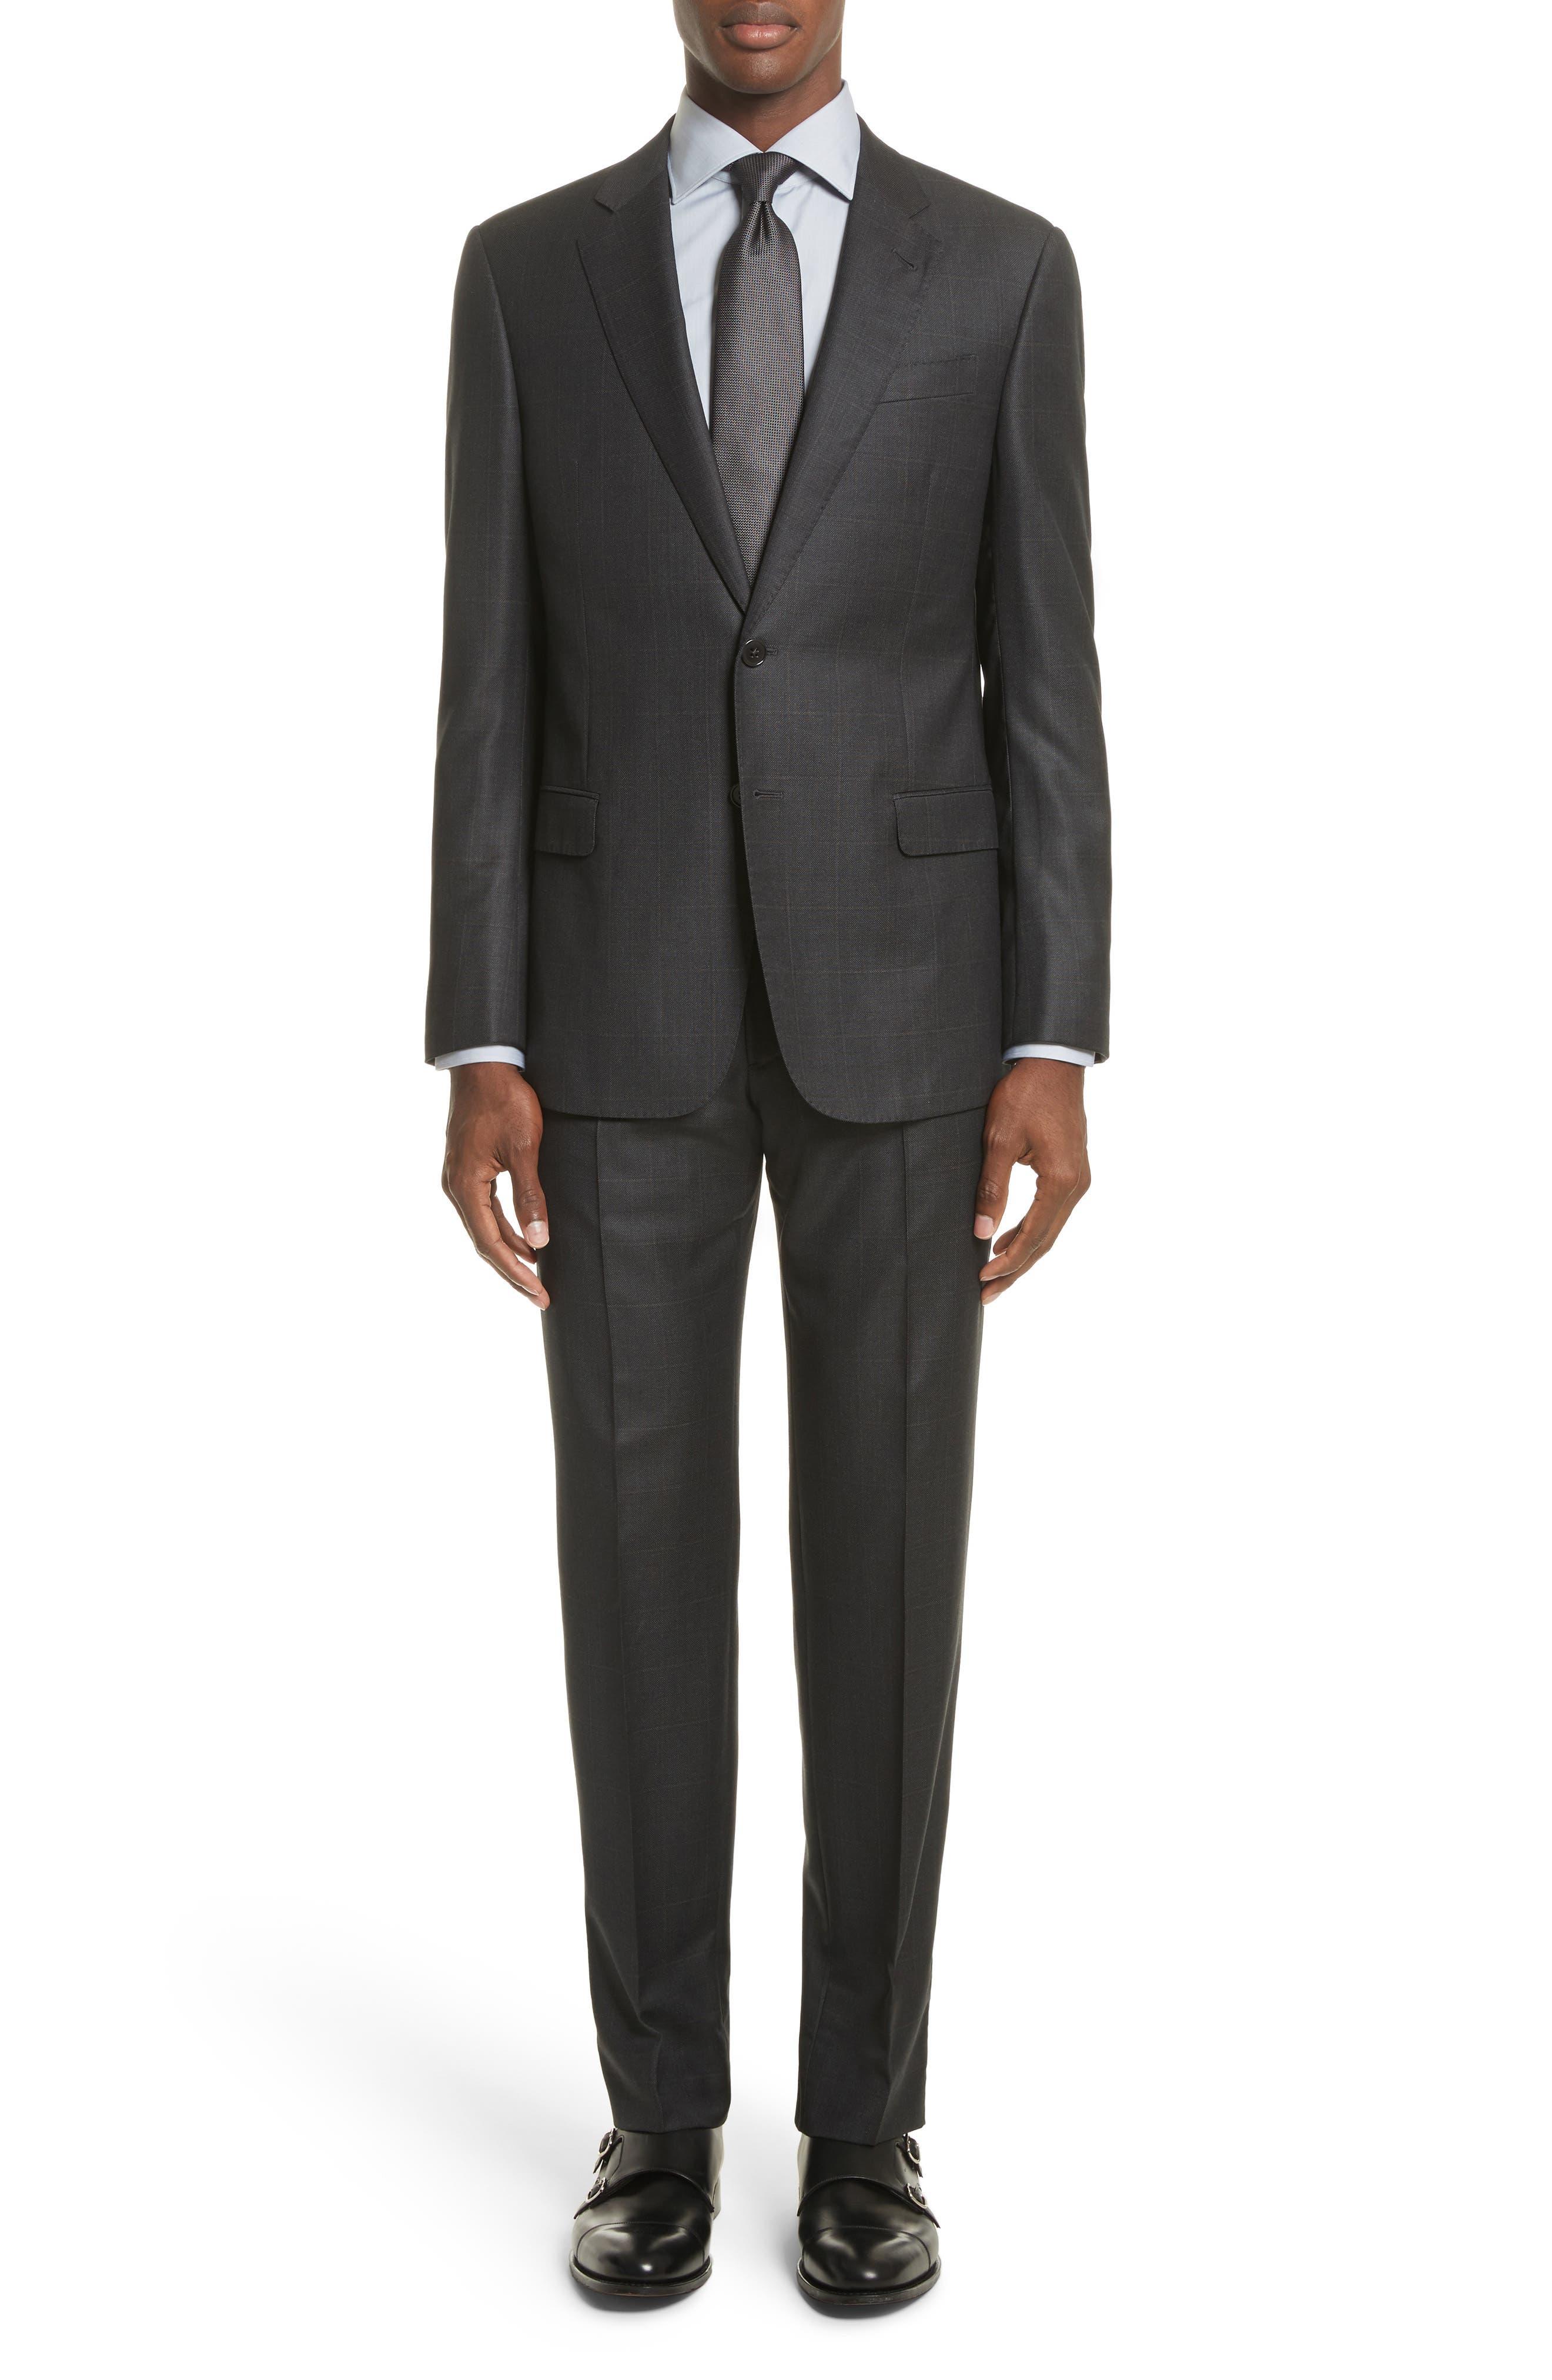 G-Line Trim Fit Windowpane Wool Suit,                         Main,                         color, Solid Light/ Pastel Grey